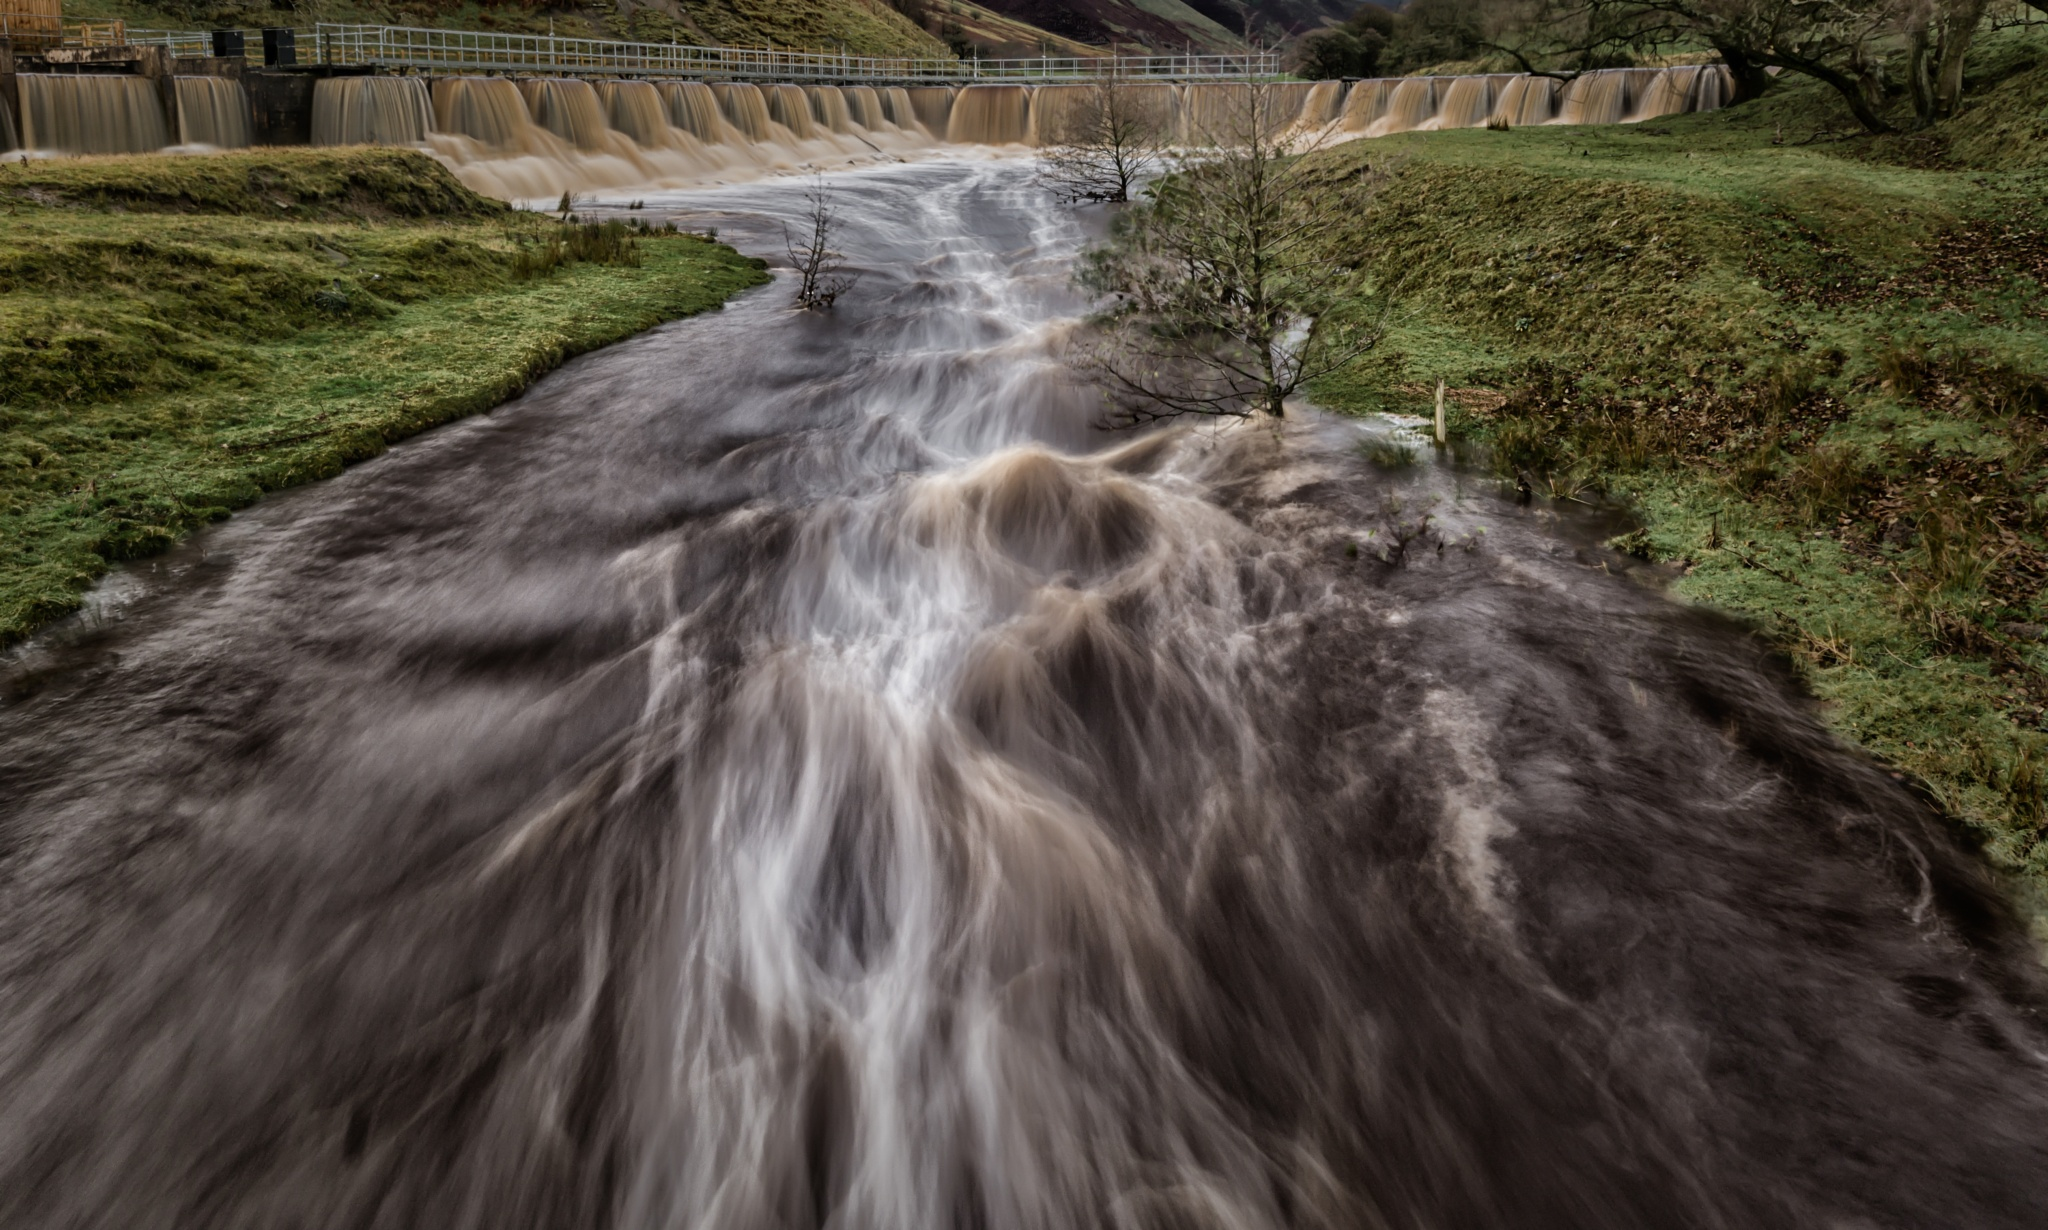 River Ashop by Michael Collier